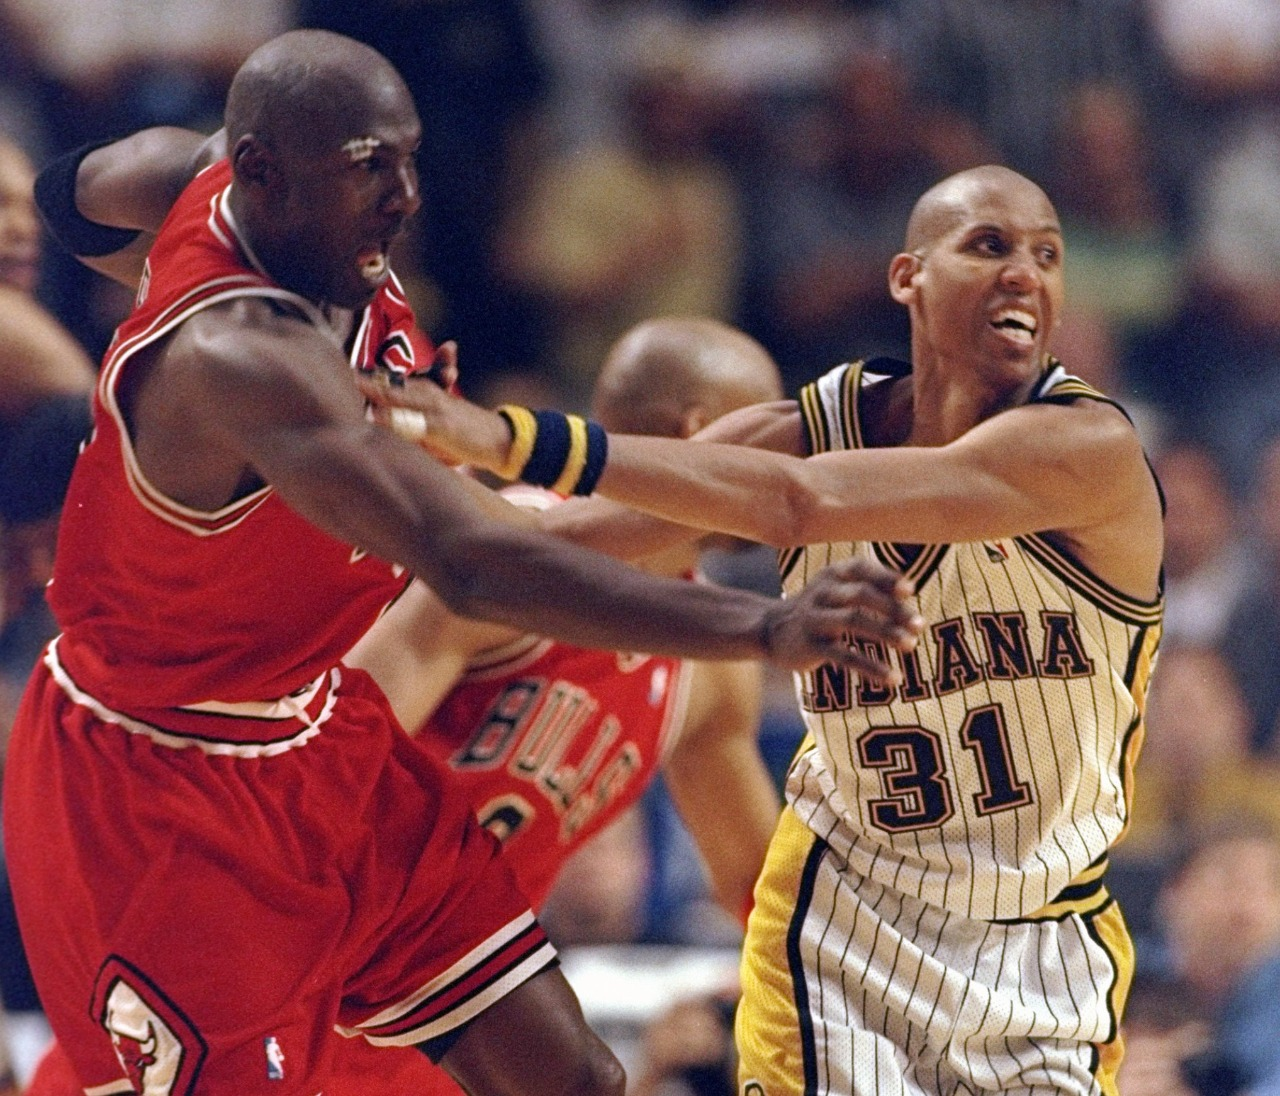 Reggie Miller dice que golpearía a Michael Jordan